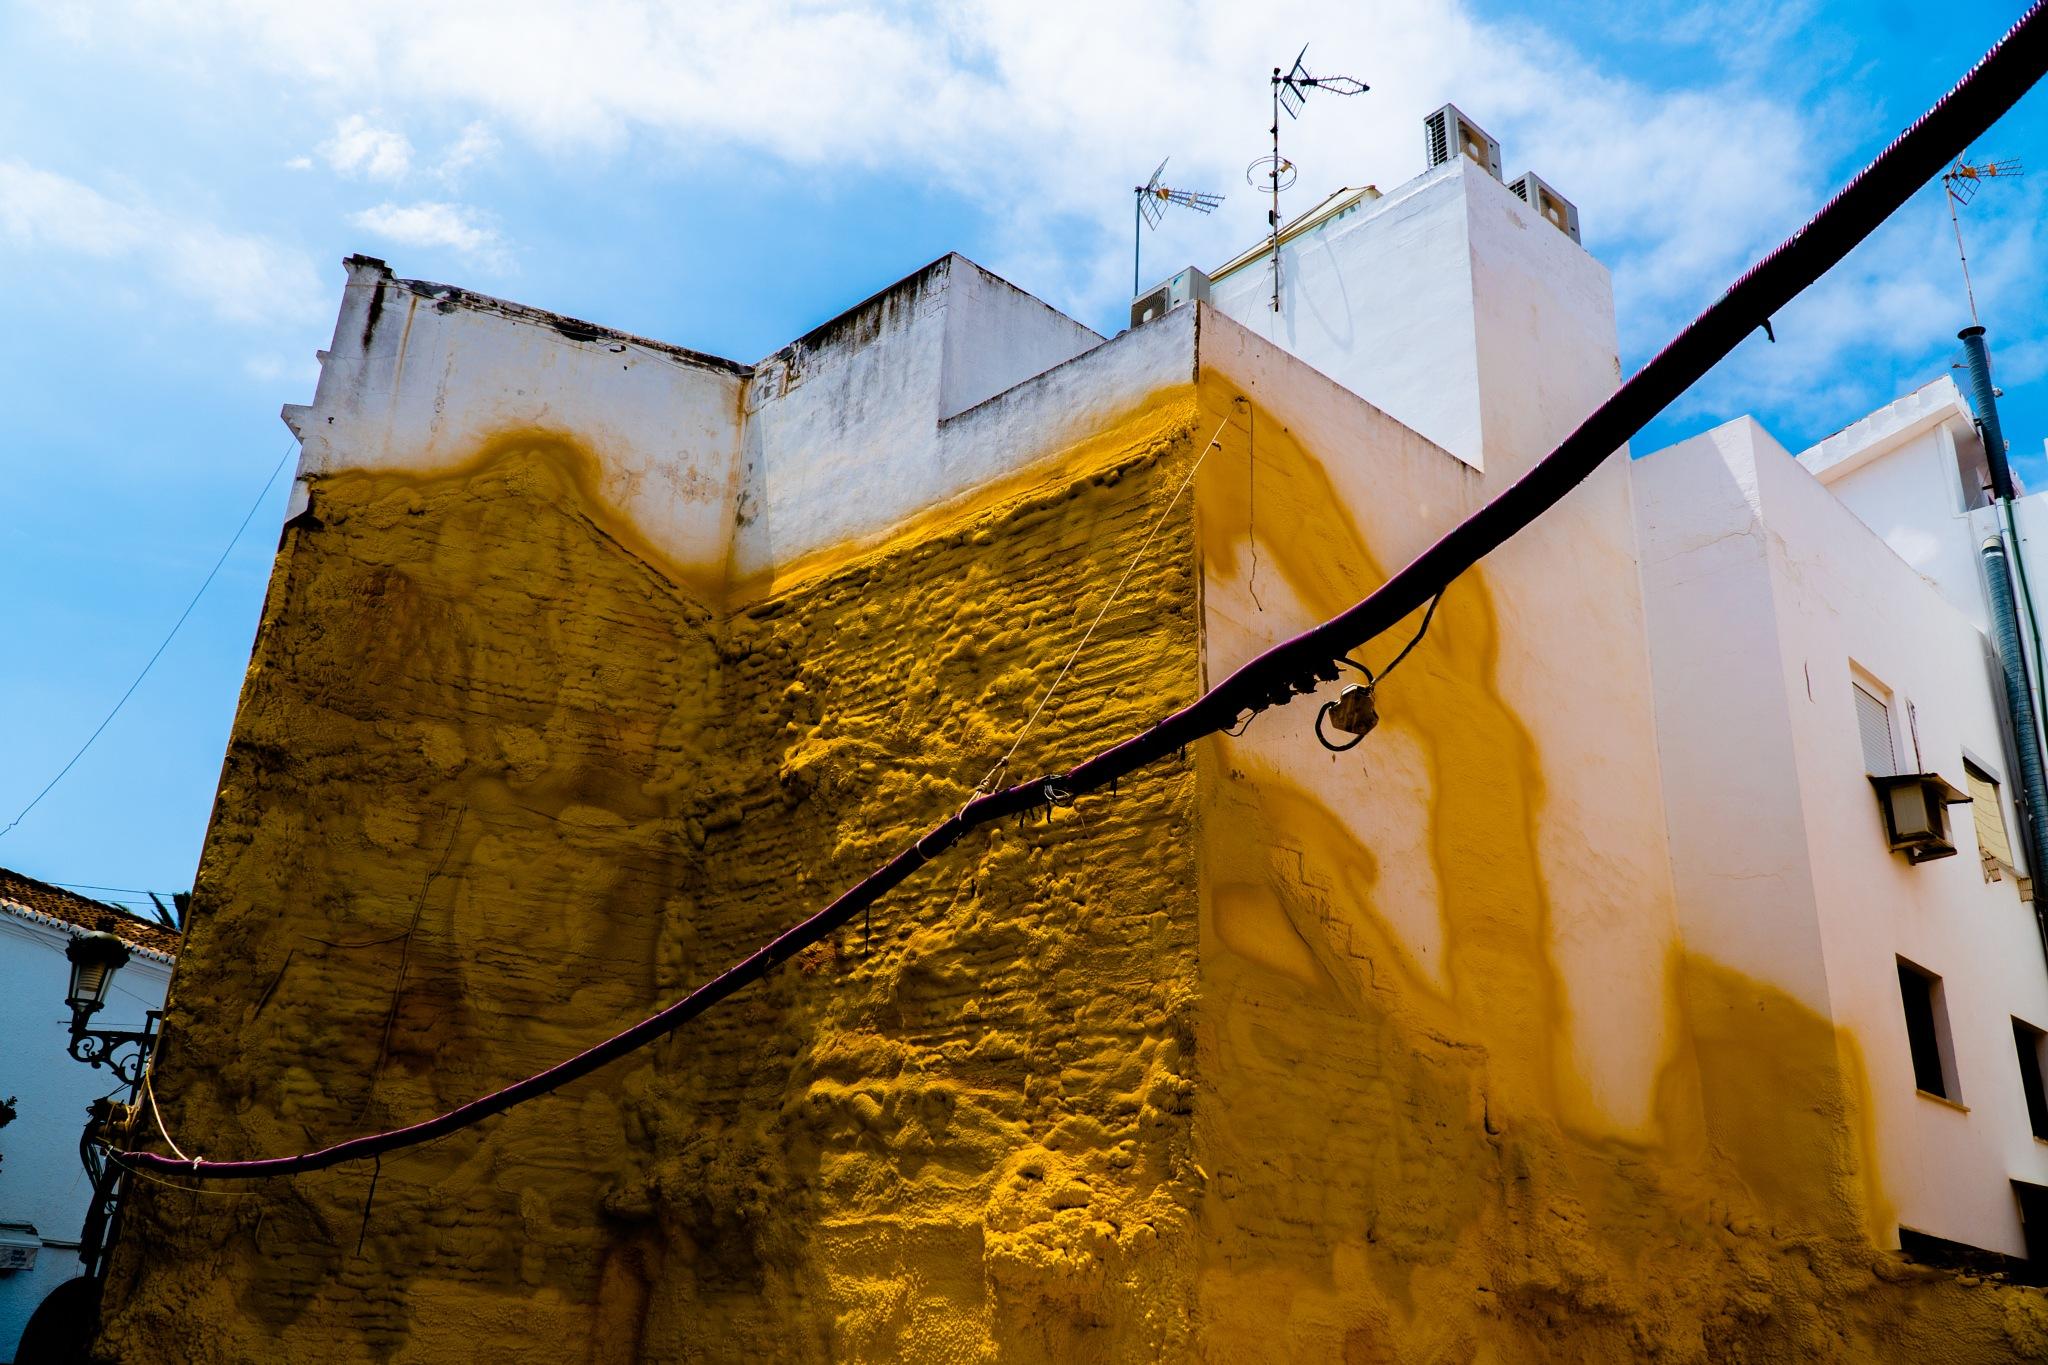 Yellow Walls by Lukeghost